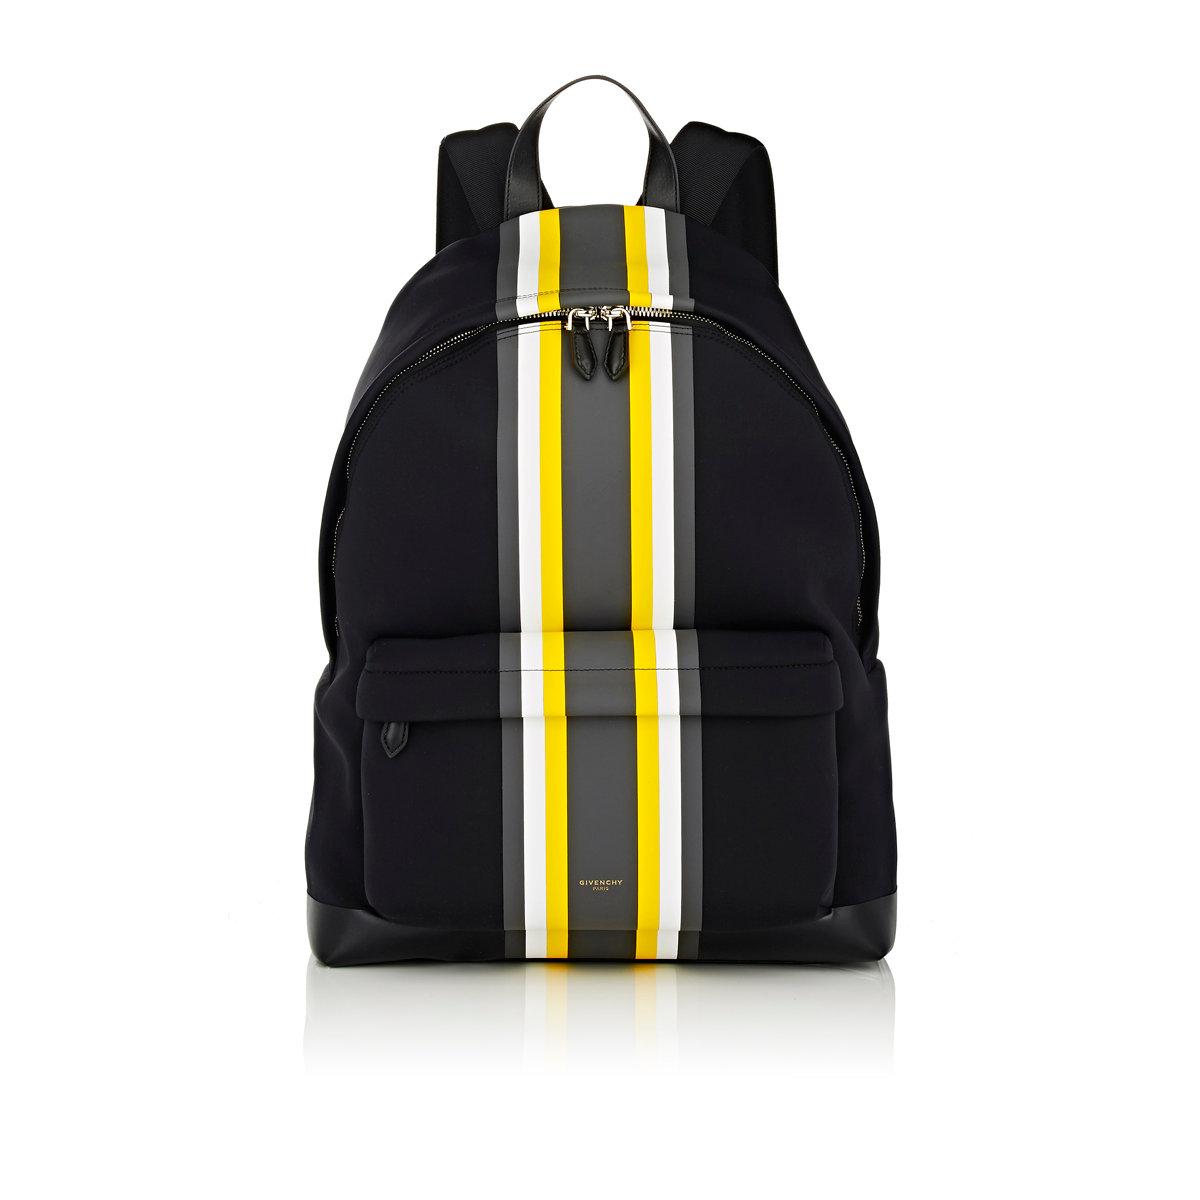 Givenchy Men s Classic Backpack in Black for Men - Lyst 5dbd42855d255